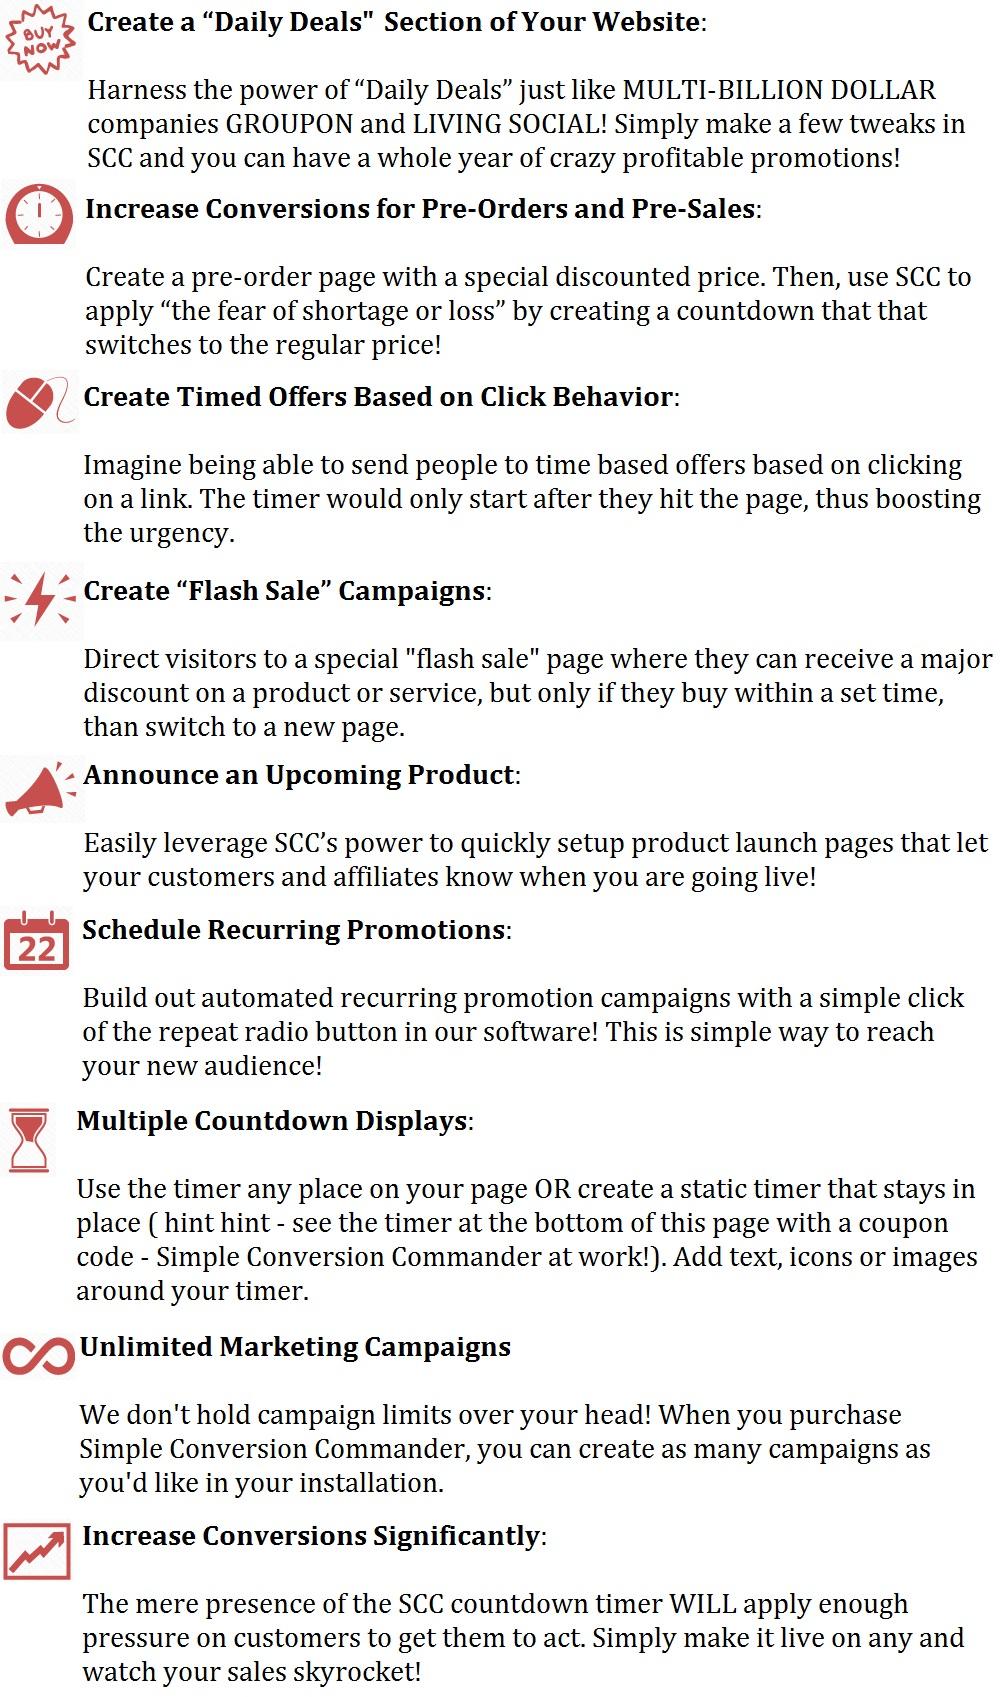 Simple-Conversion-Commander-Features